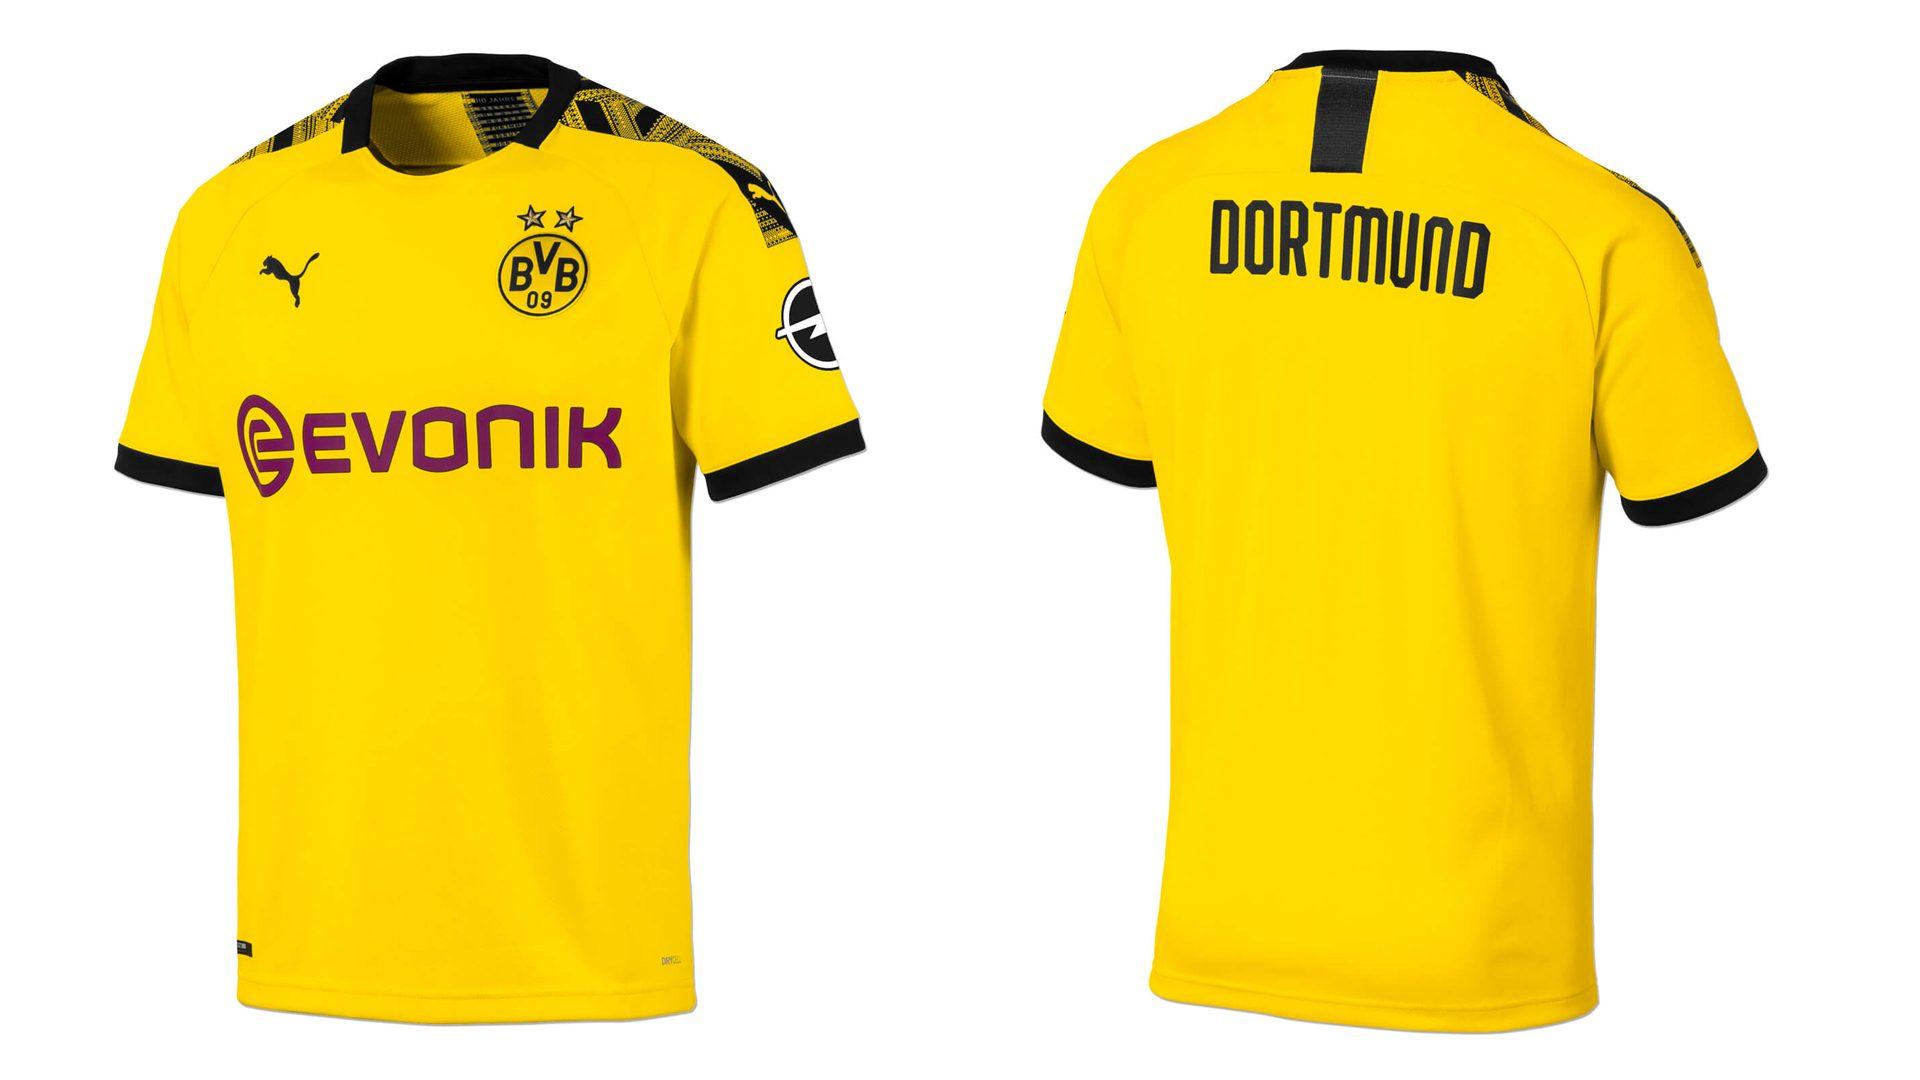 Bundesliga | Borussia Dortmund release new jersey for 2019/20